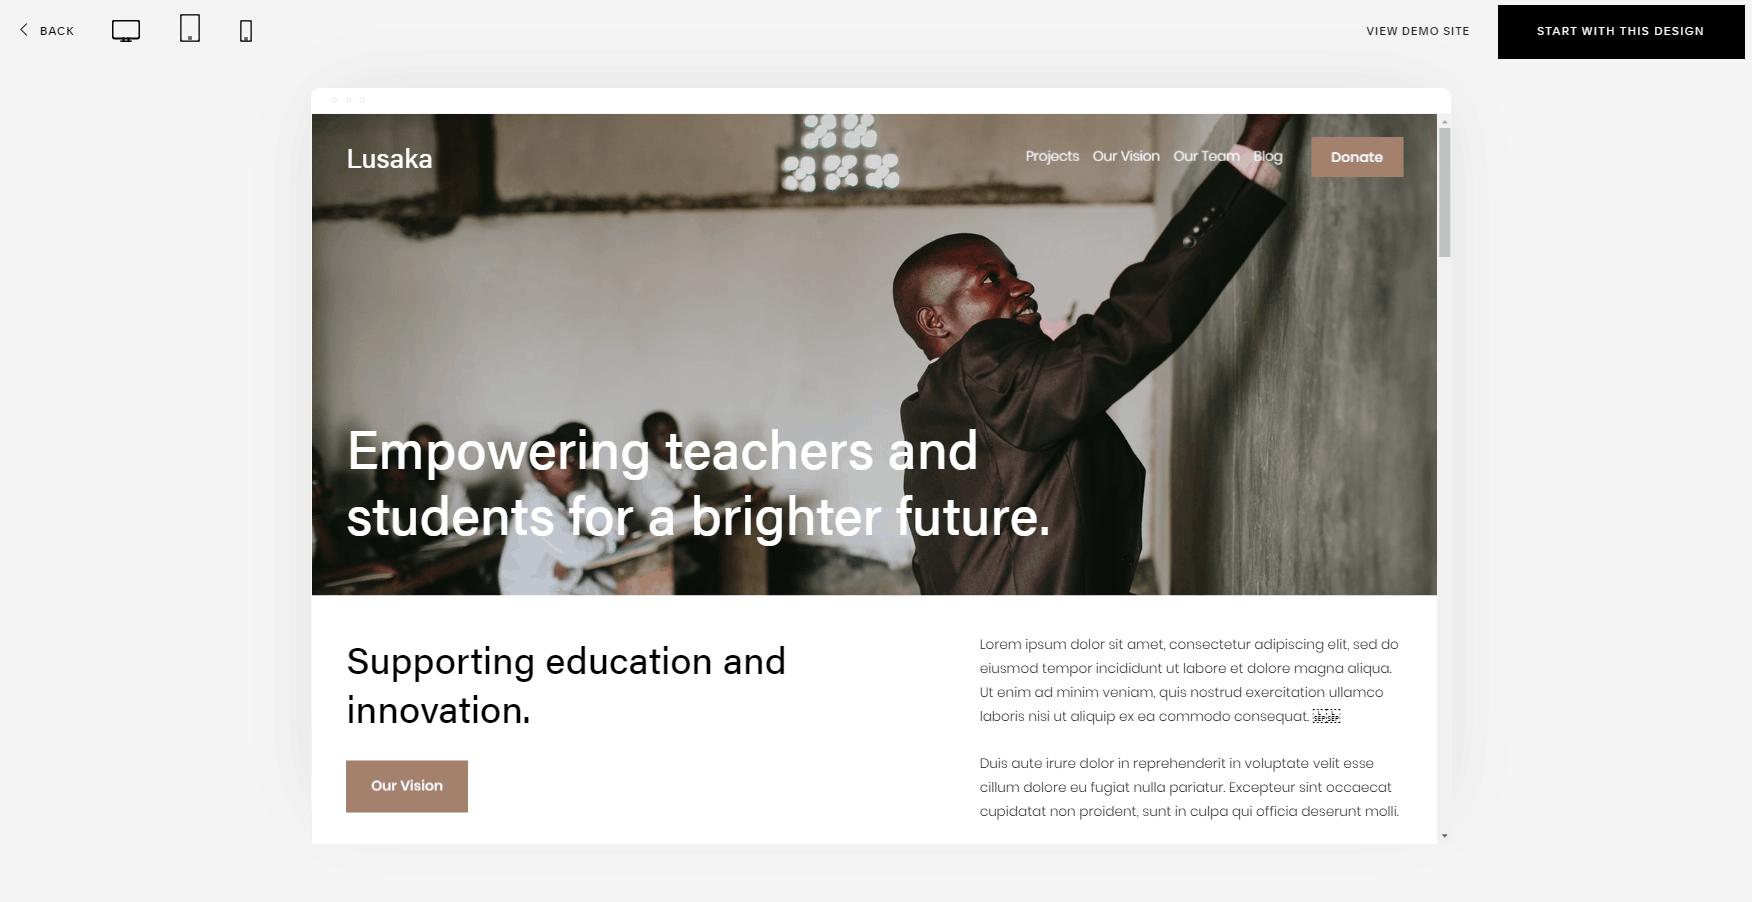 Squarespace Lusaka Nonprofit Template